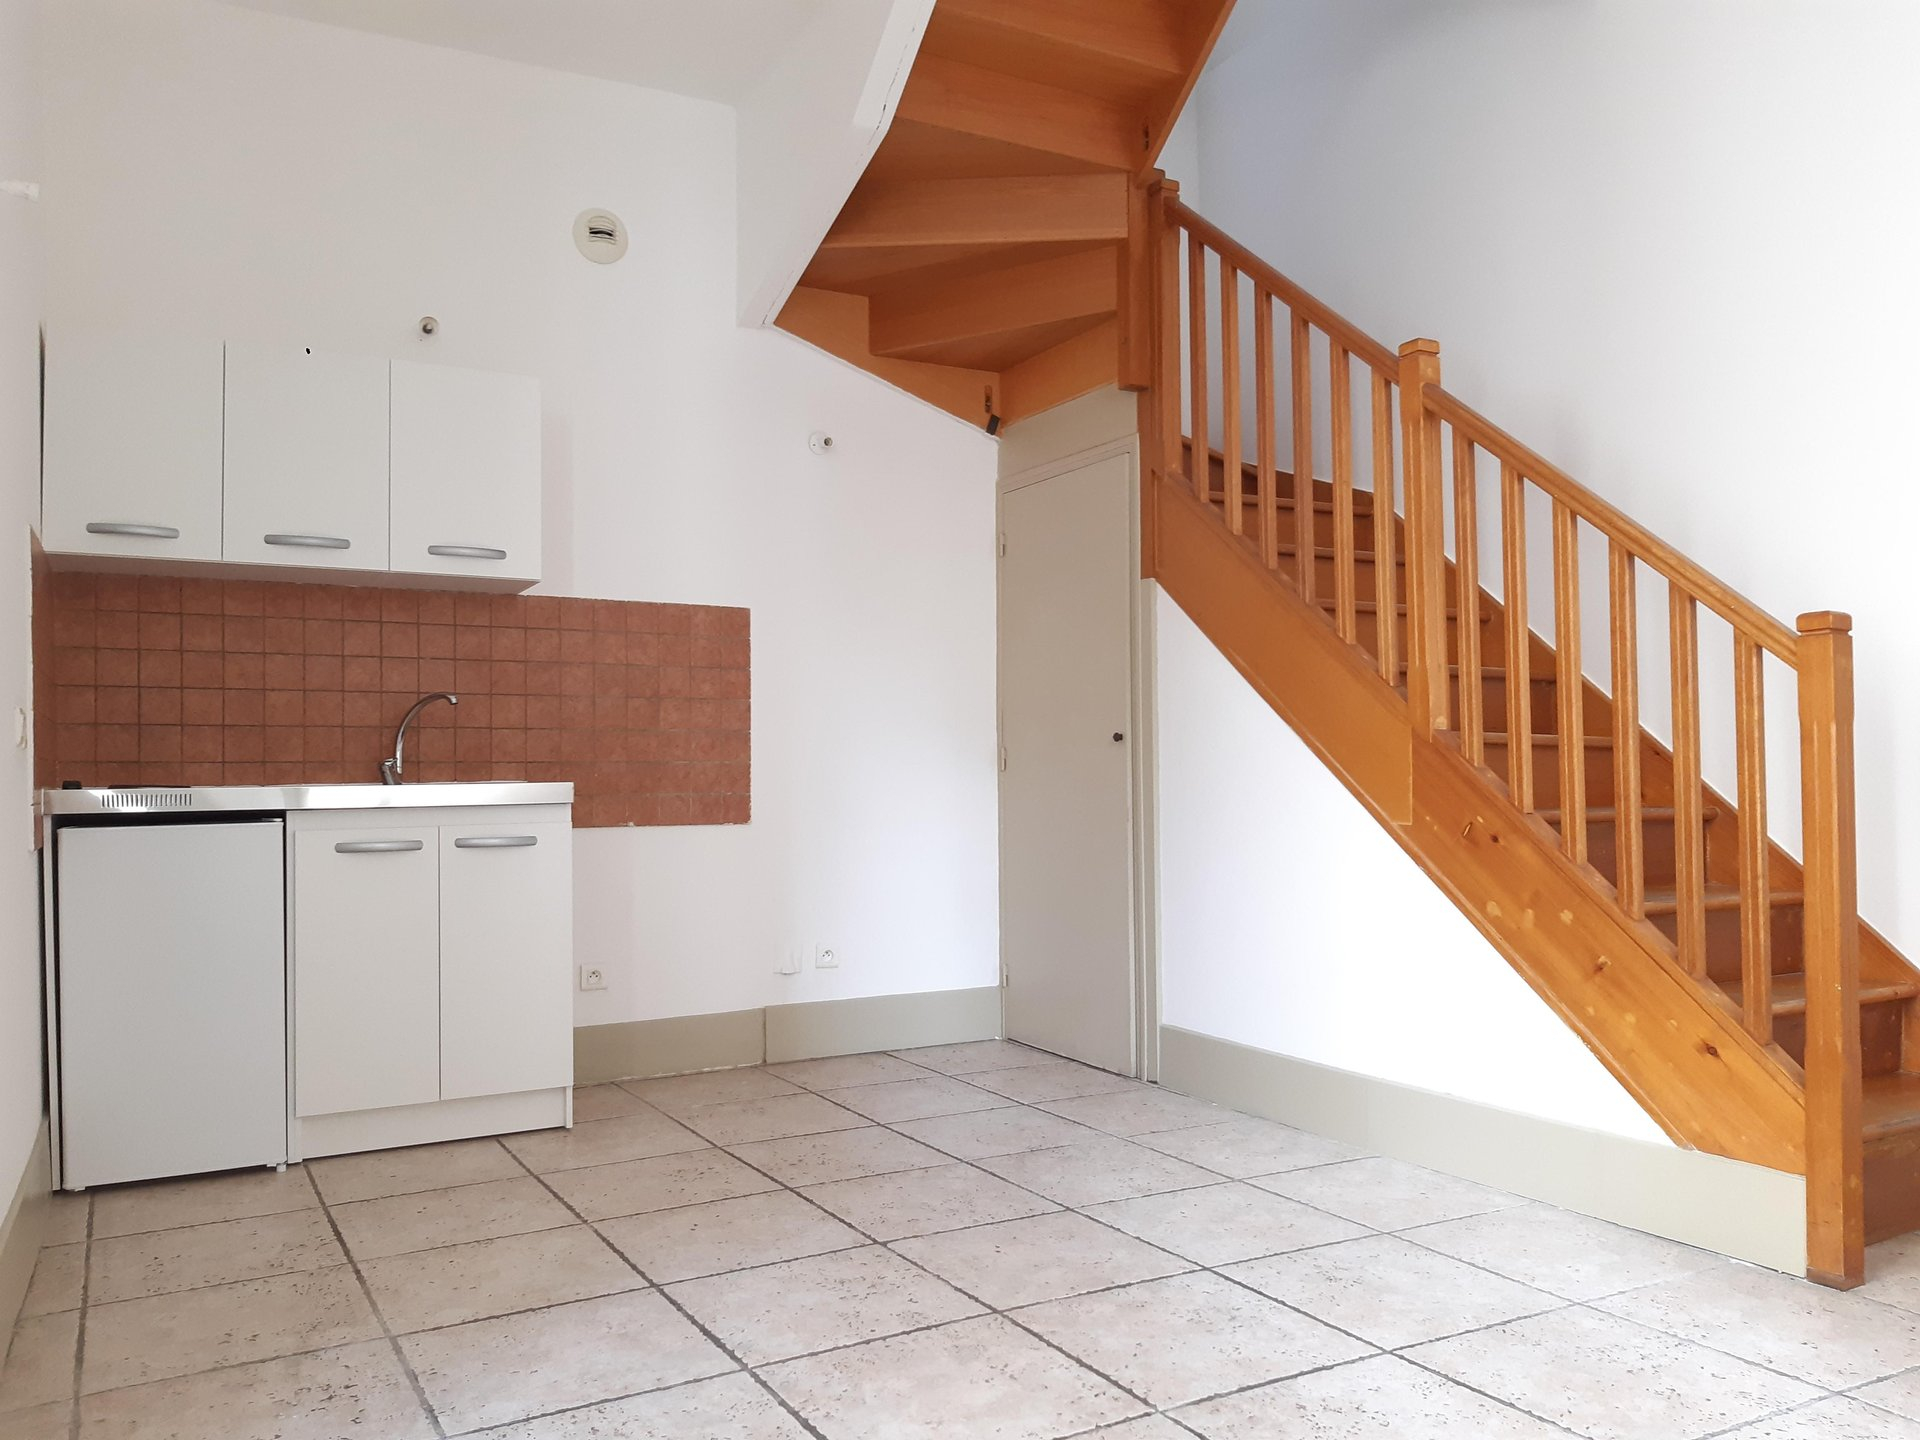 Location Appartement BEAUCAIRE Mandat : 0285